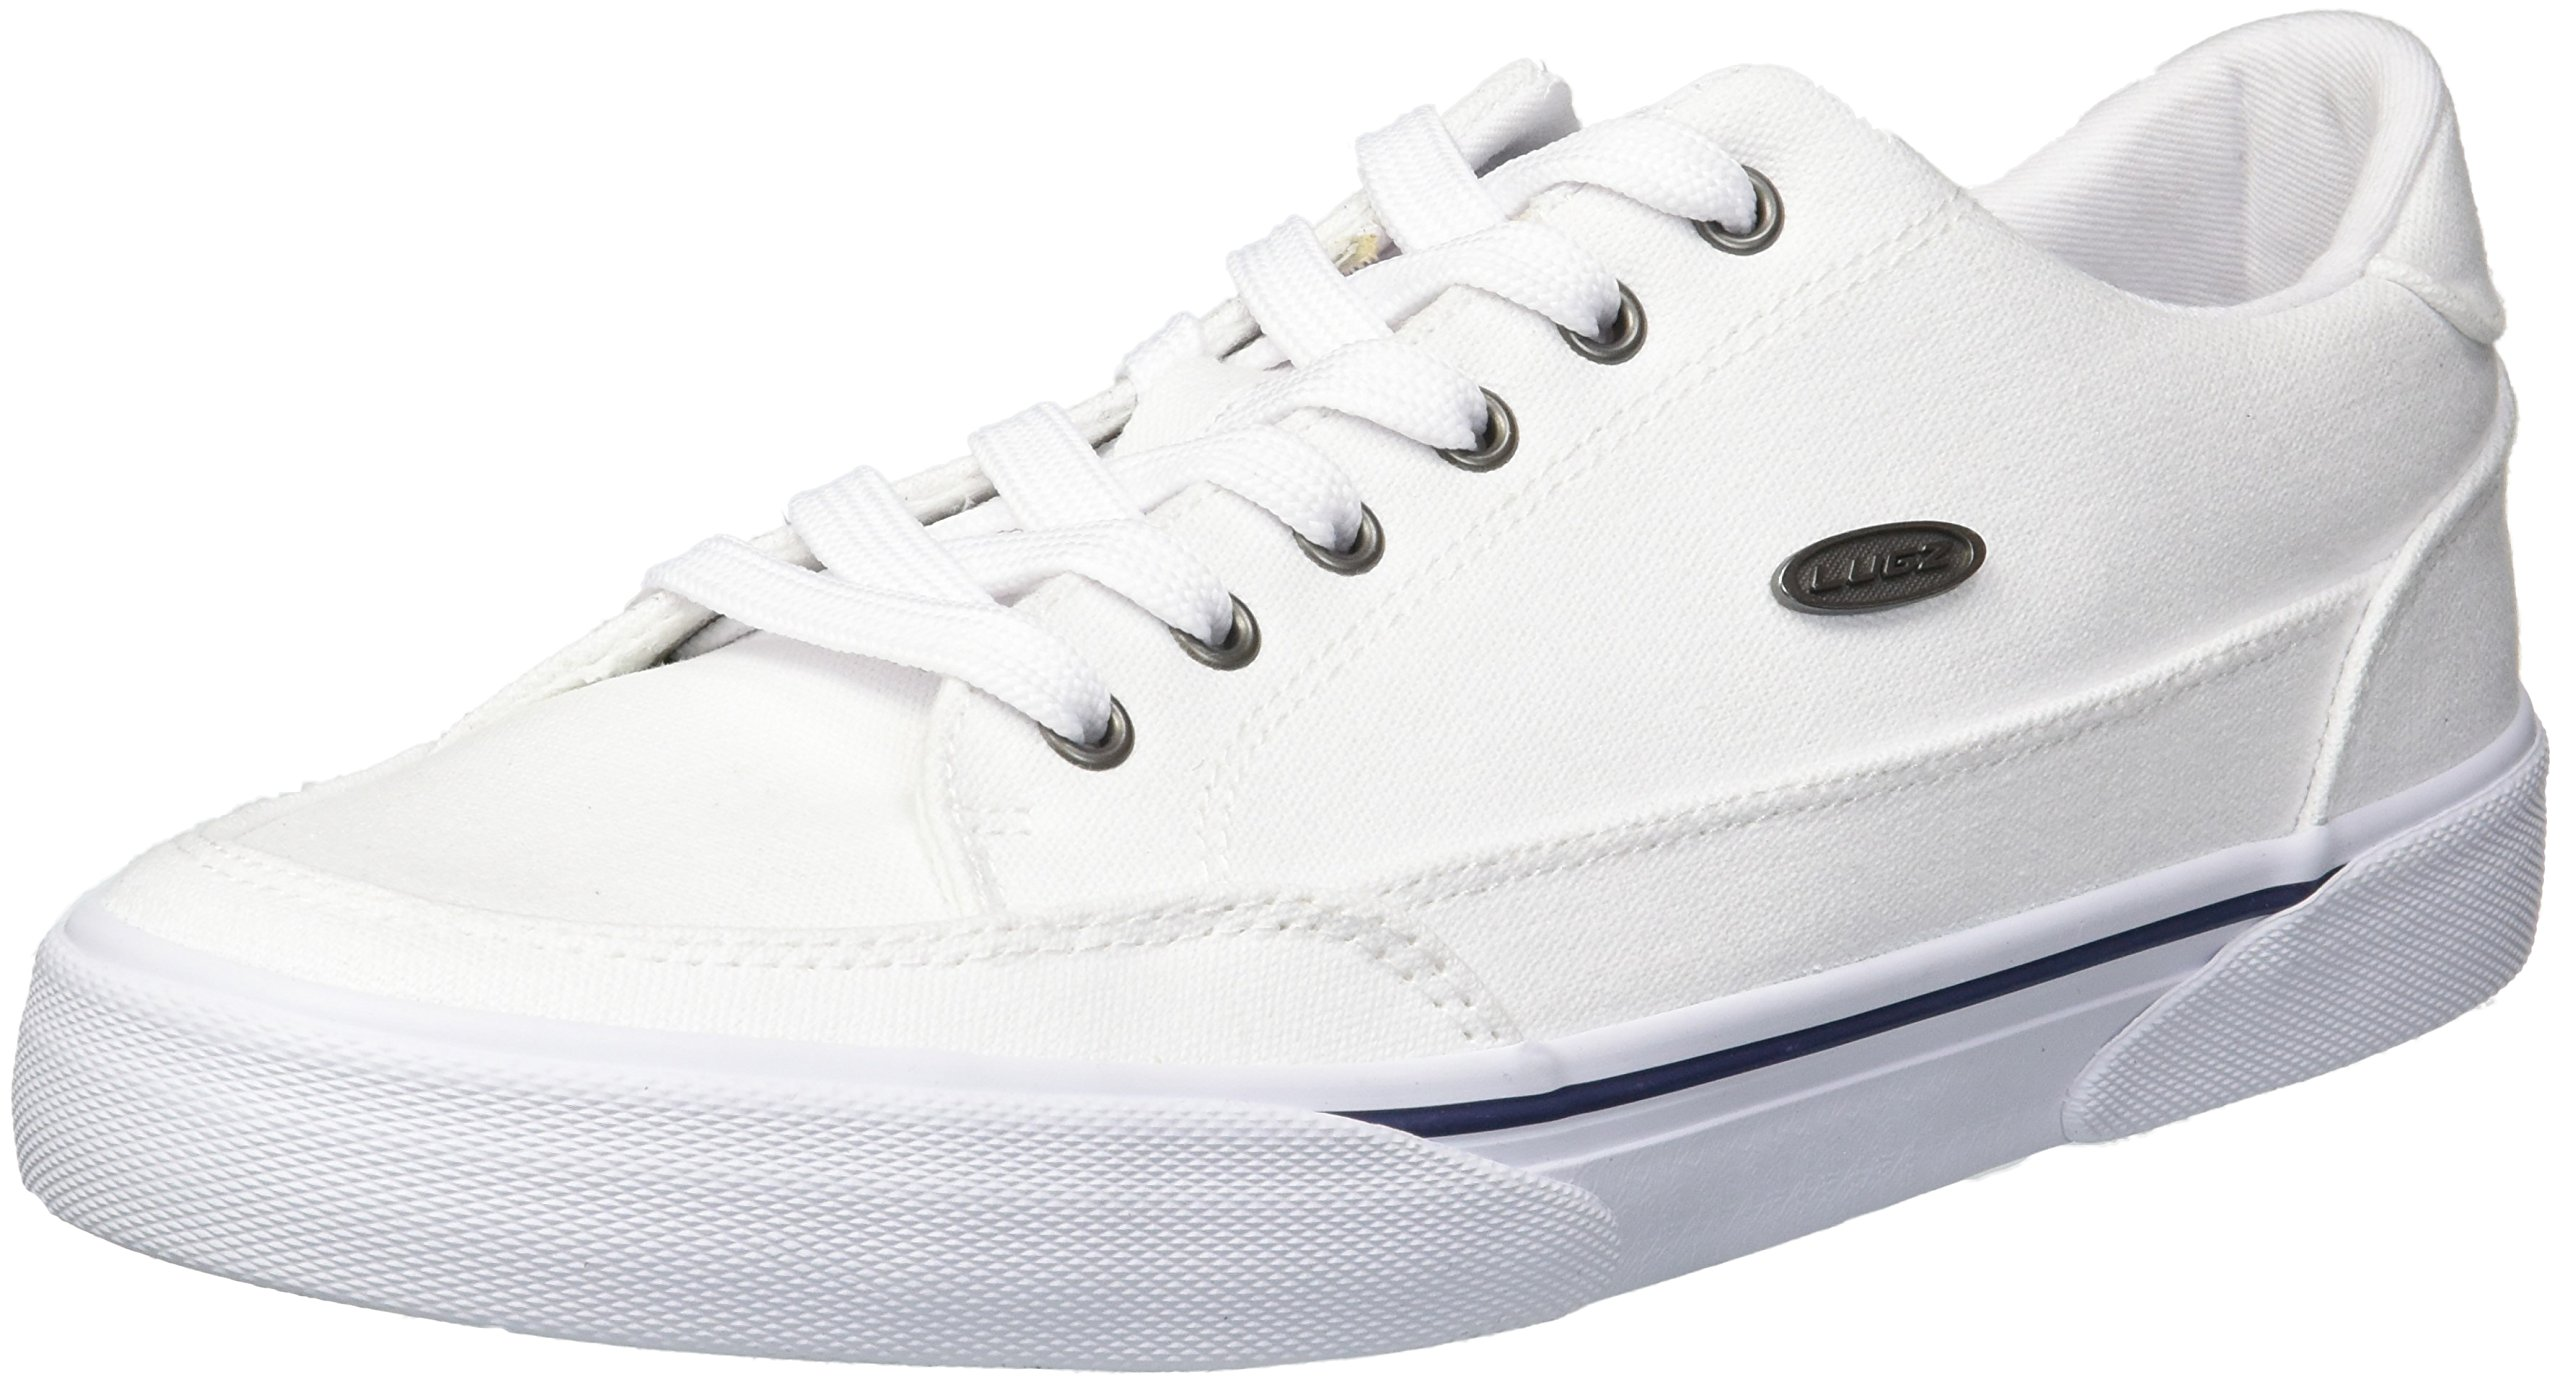 Lugz Men's Stockwell Sneaker- Buy